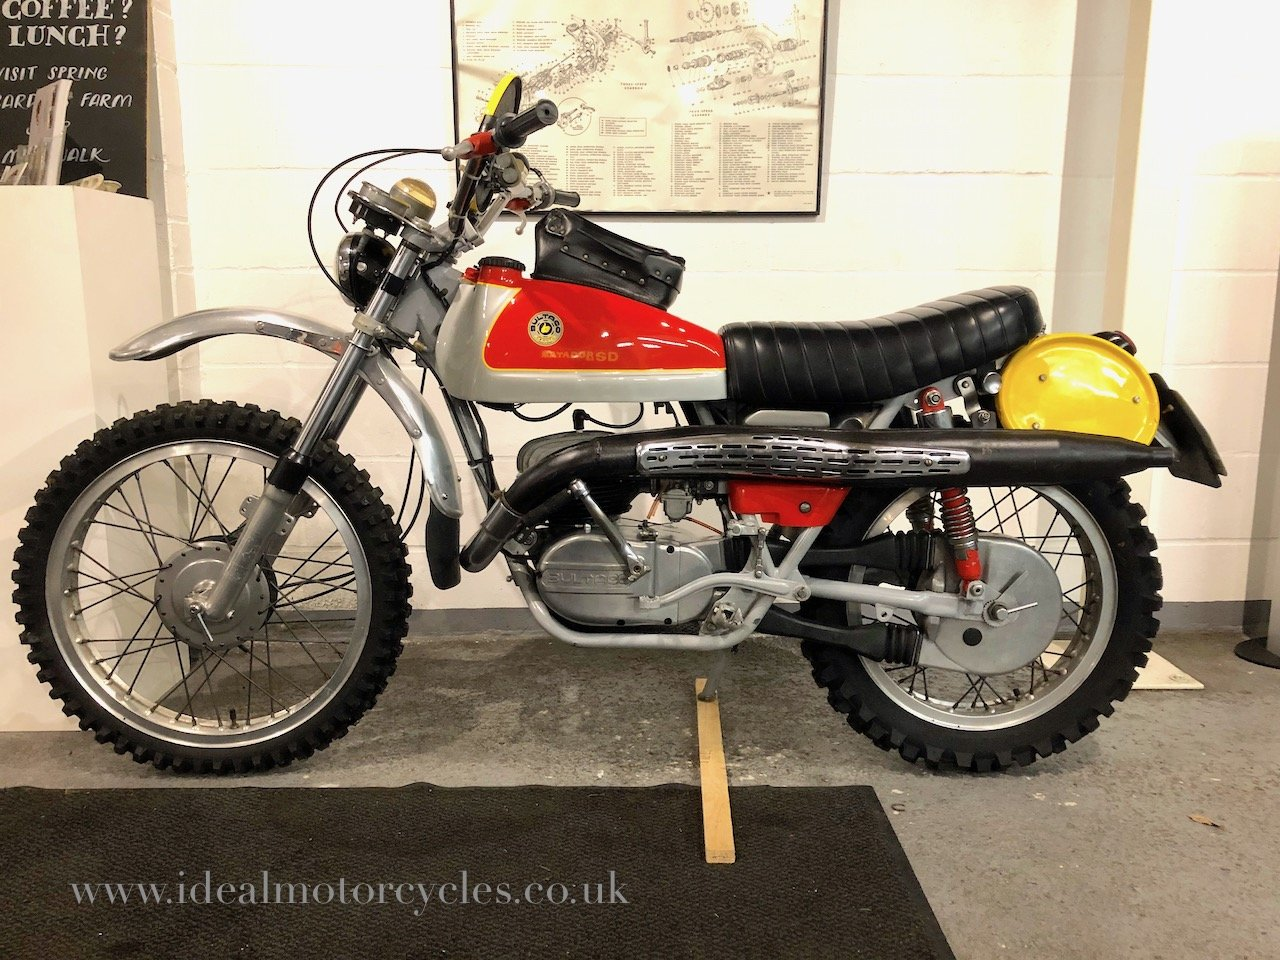 1973 Bultaco Matador Mk4 250cc Enduro Motorcycle For Sale (picture 3 of 6)